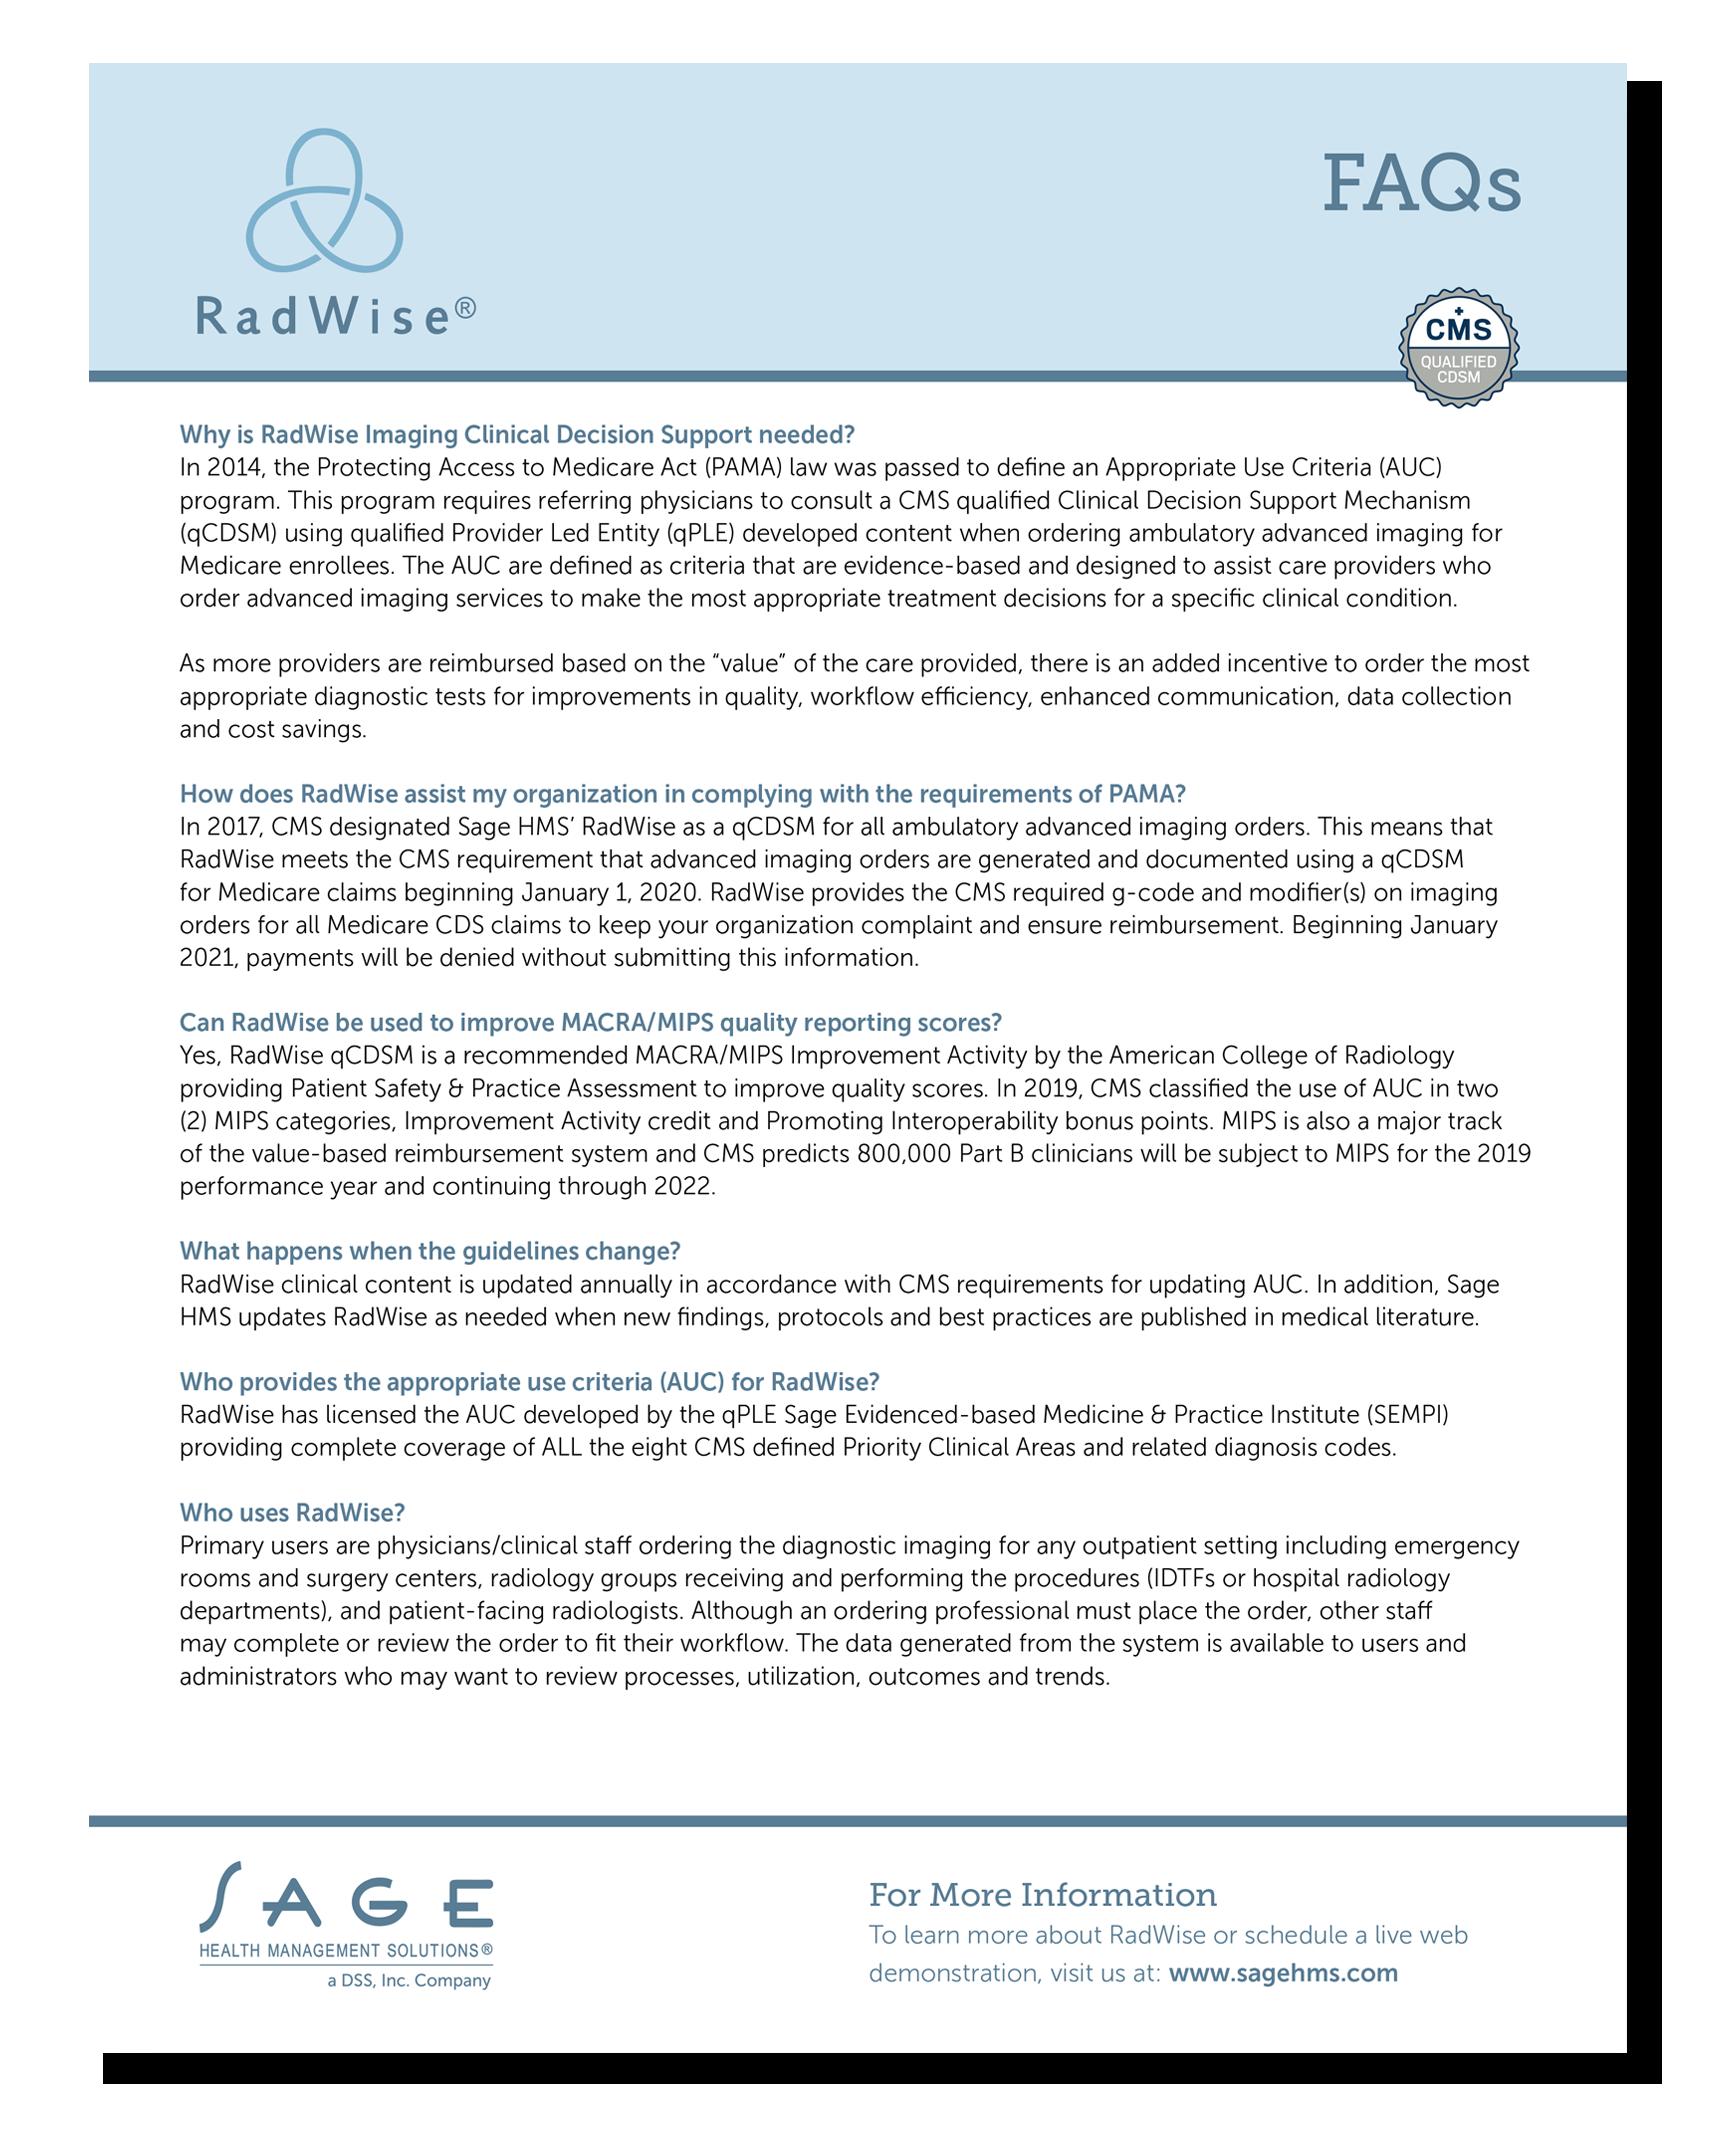 RadWise FAQs